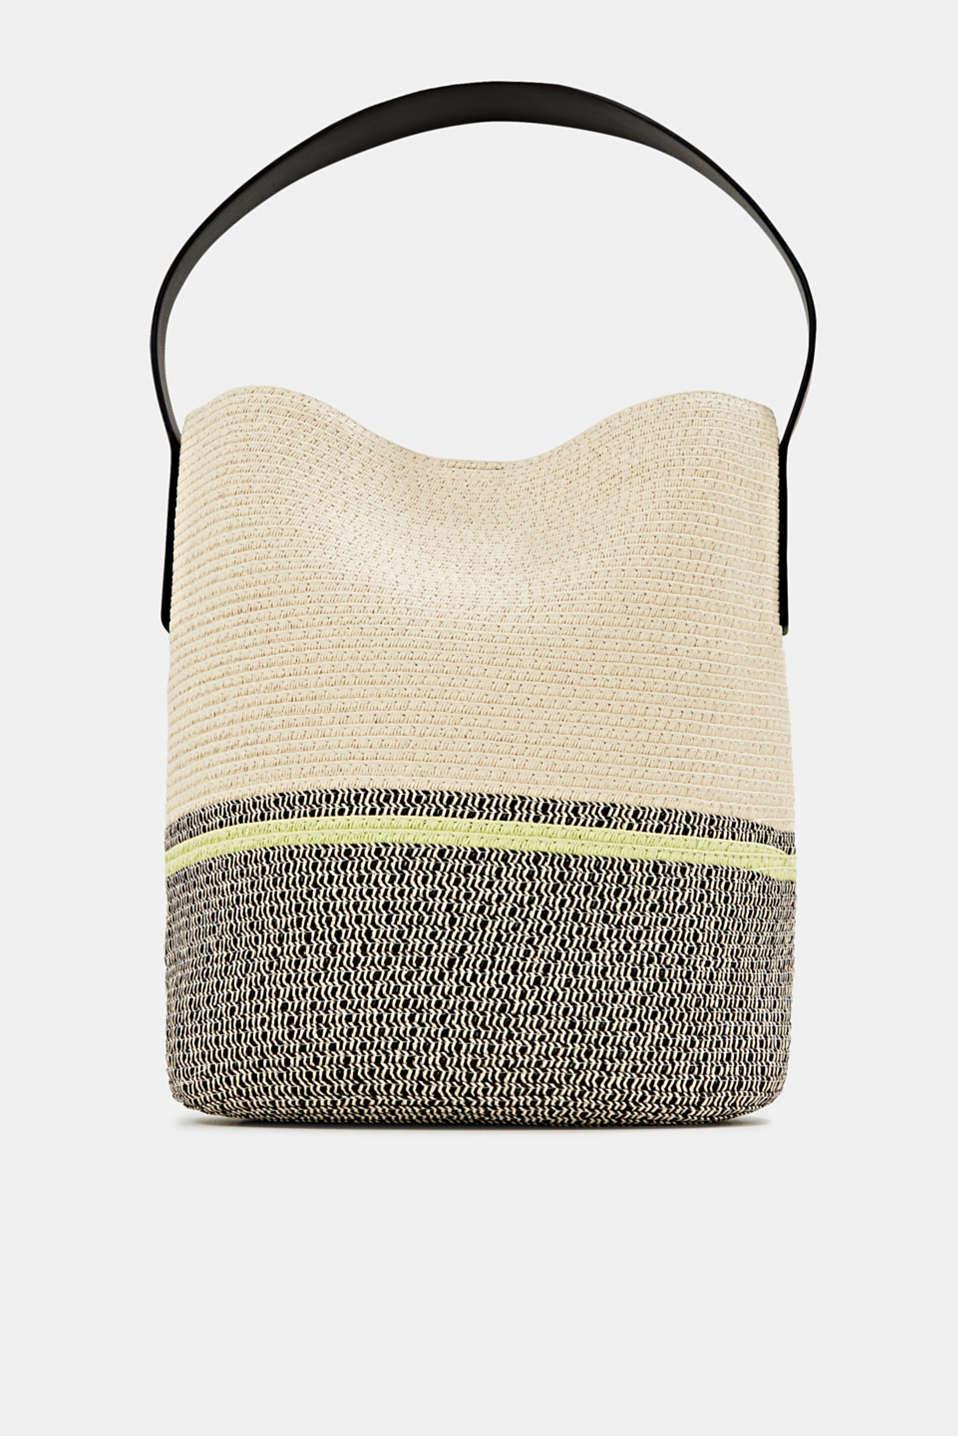 Bast shopper with contrast stripes, CREAM BEIGE, detail image number 0